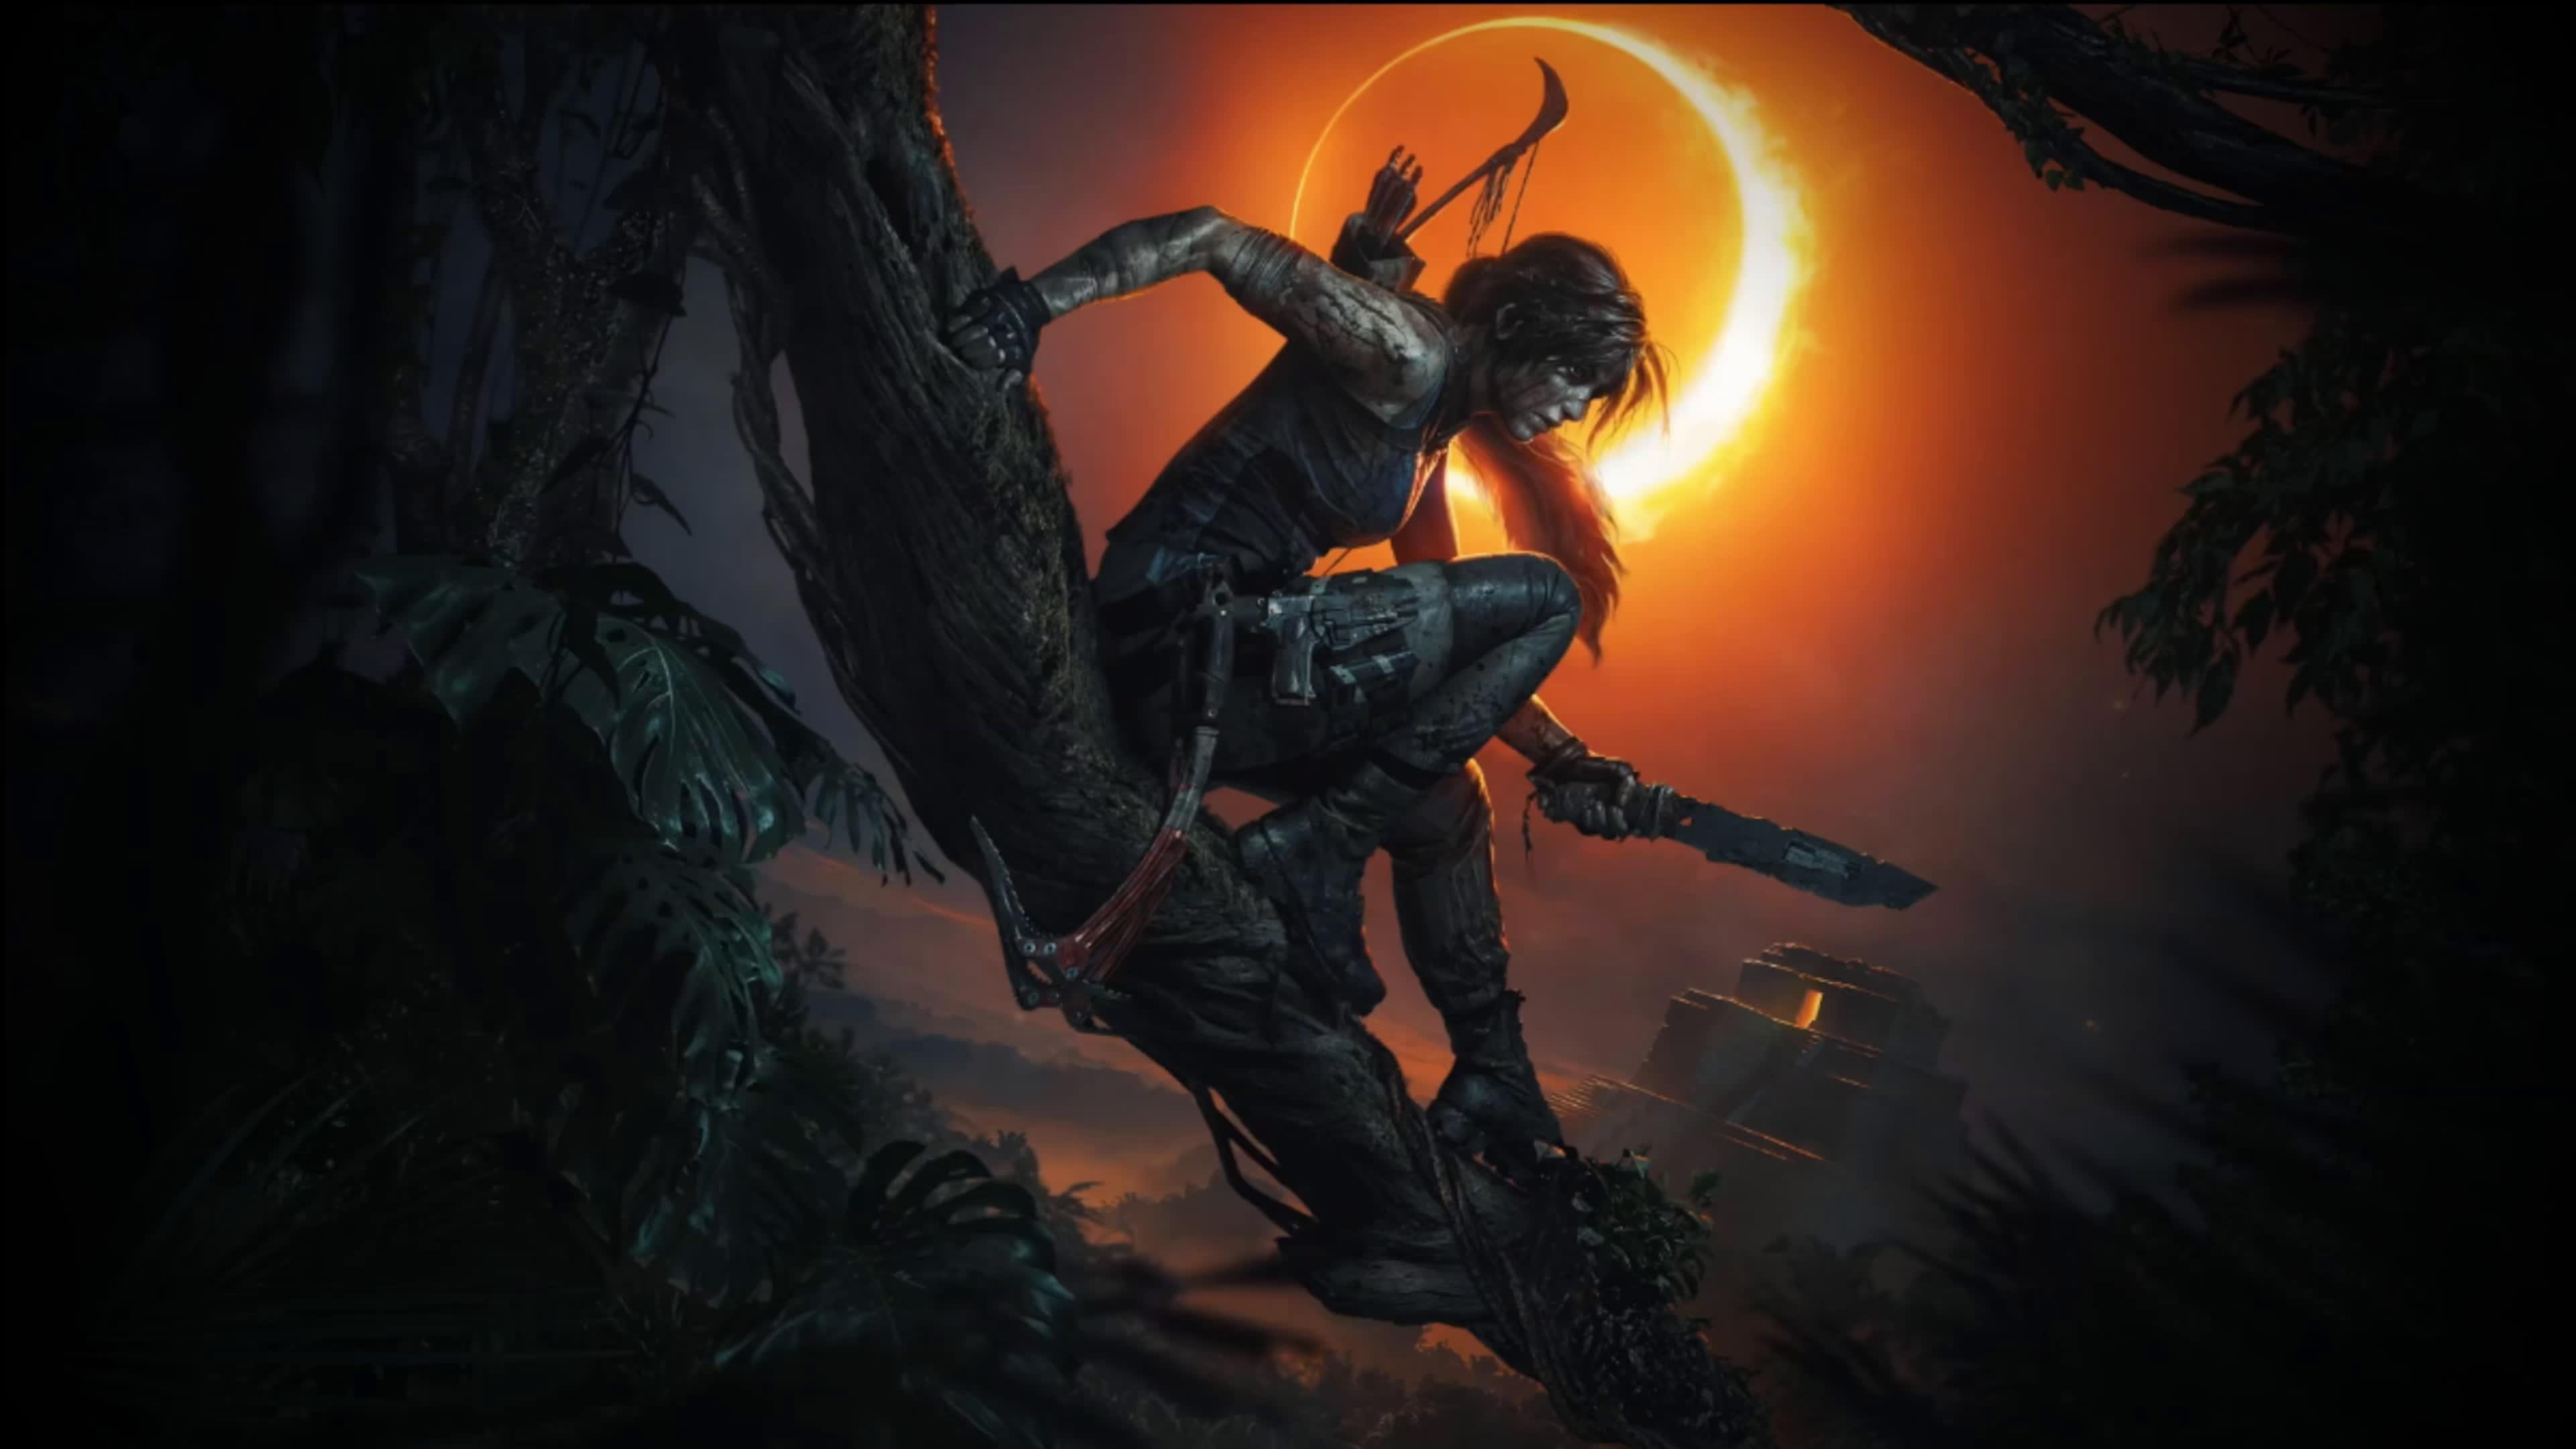 Tomb Raider Wallpapers - Wallpaper Cave